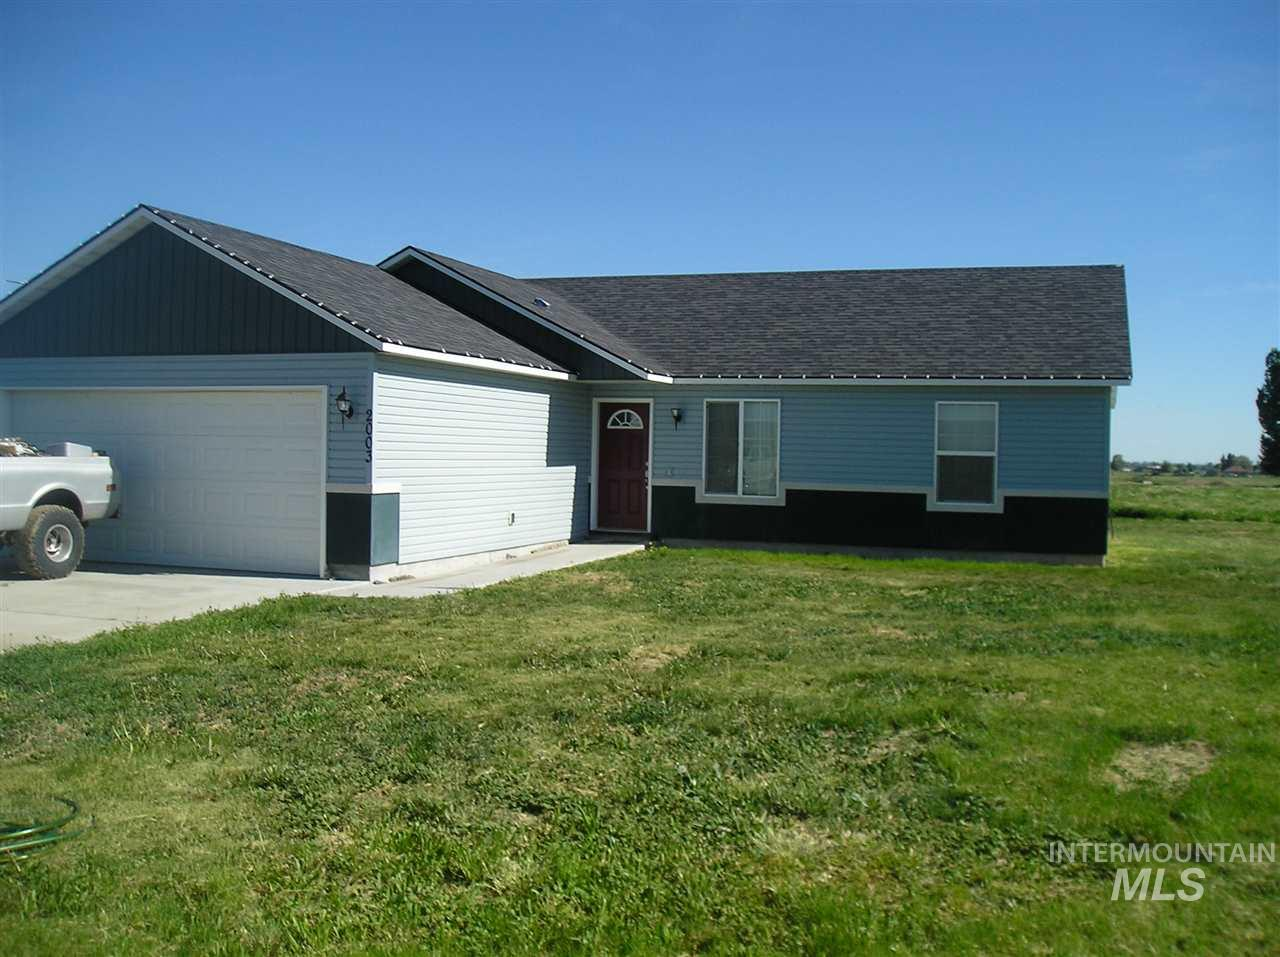 Single Family Home for Sale at 2003 E 1400 S Gooding, Idaho 83330